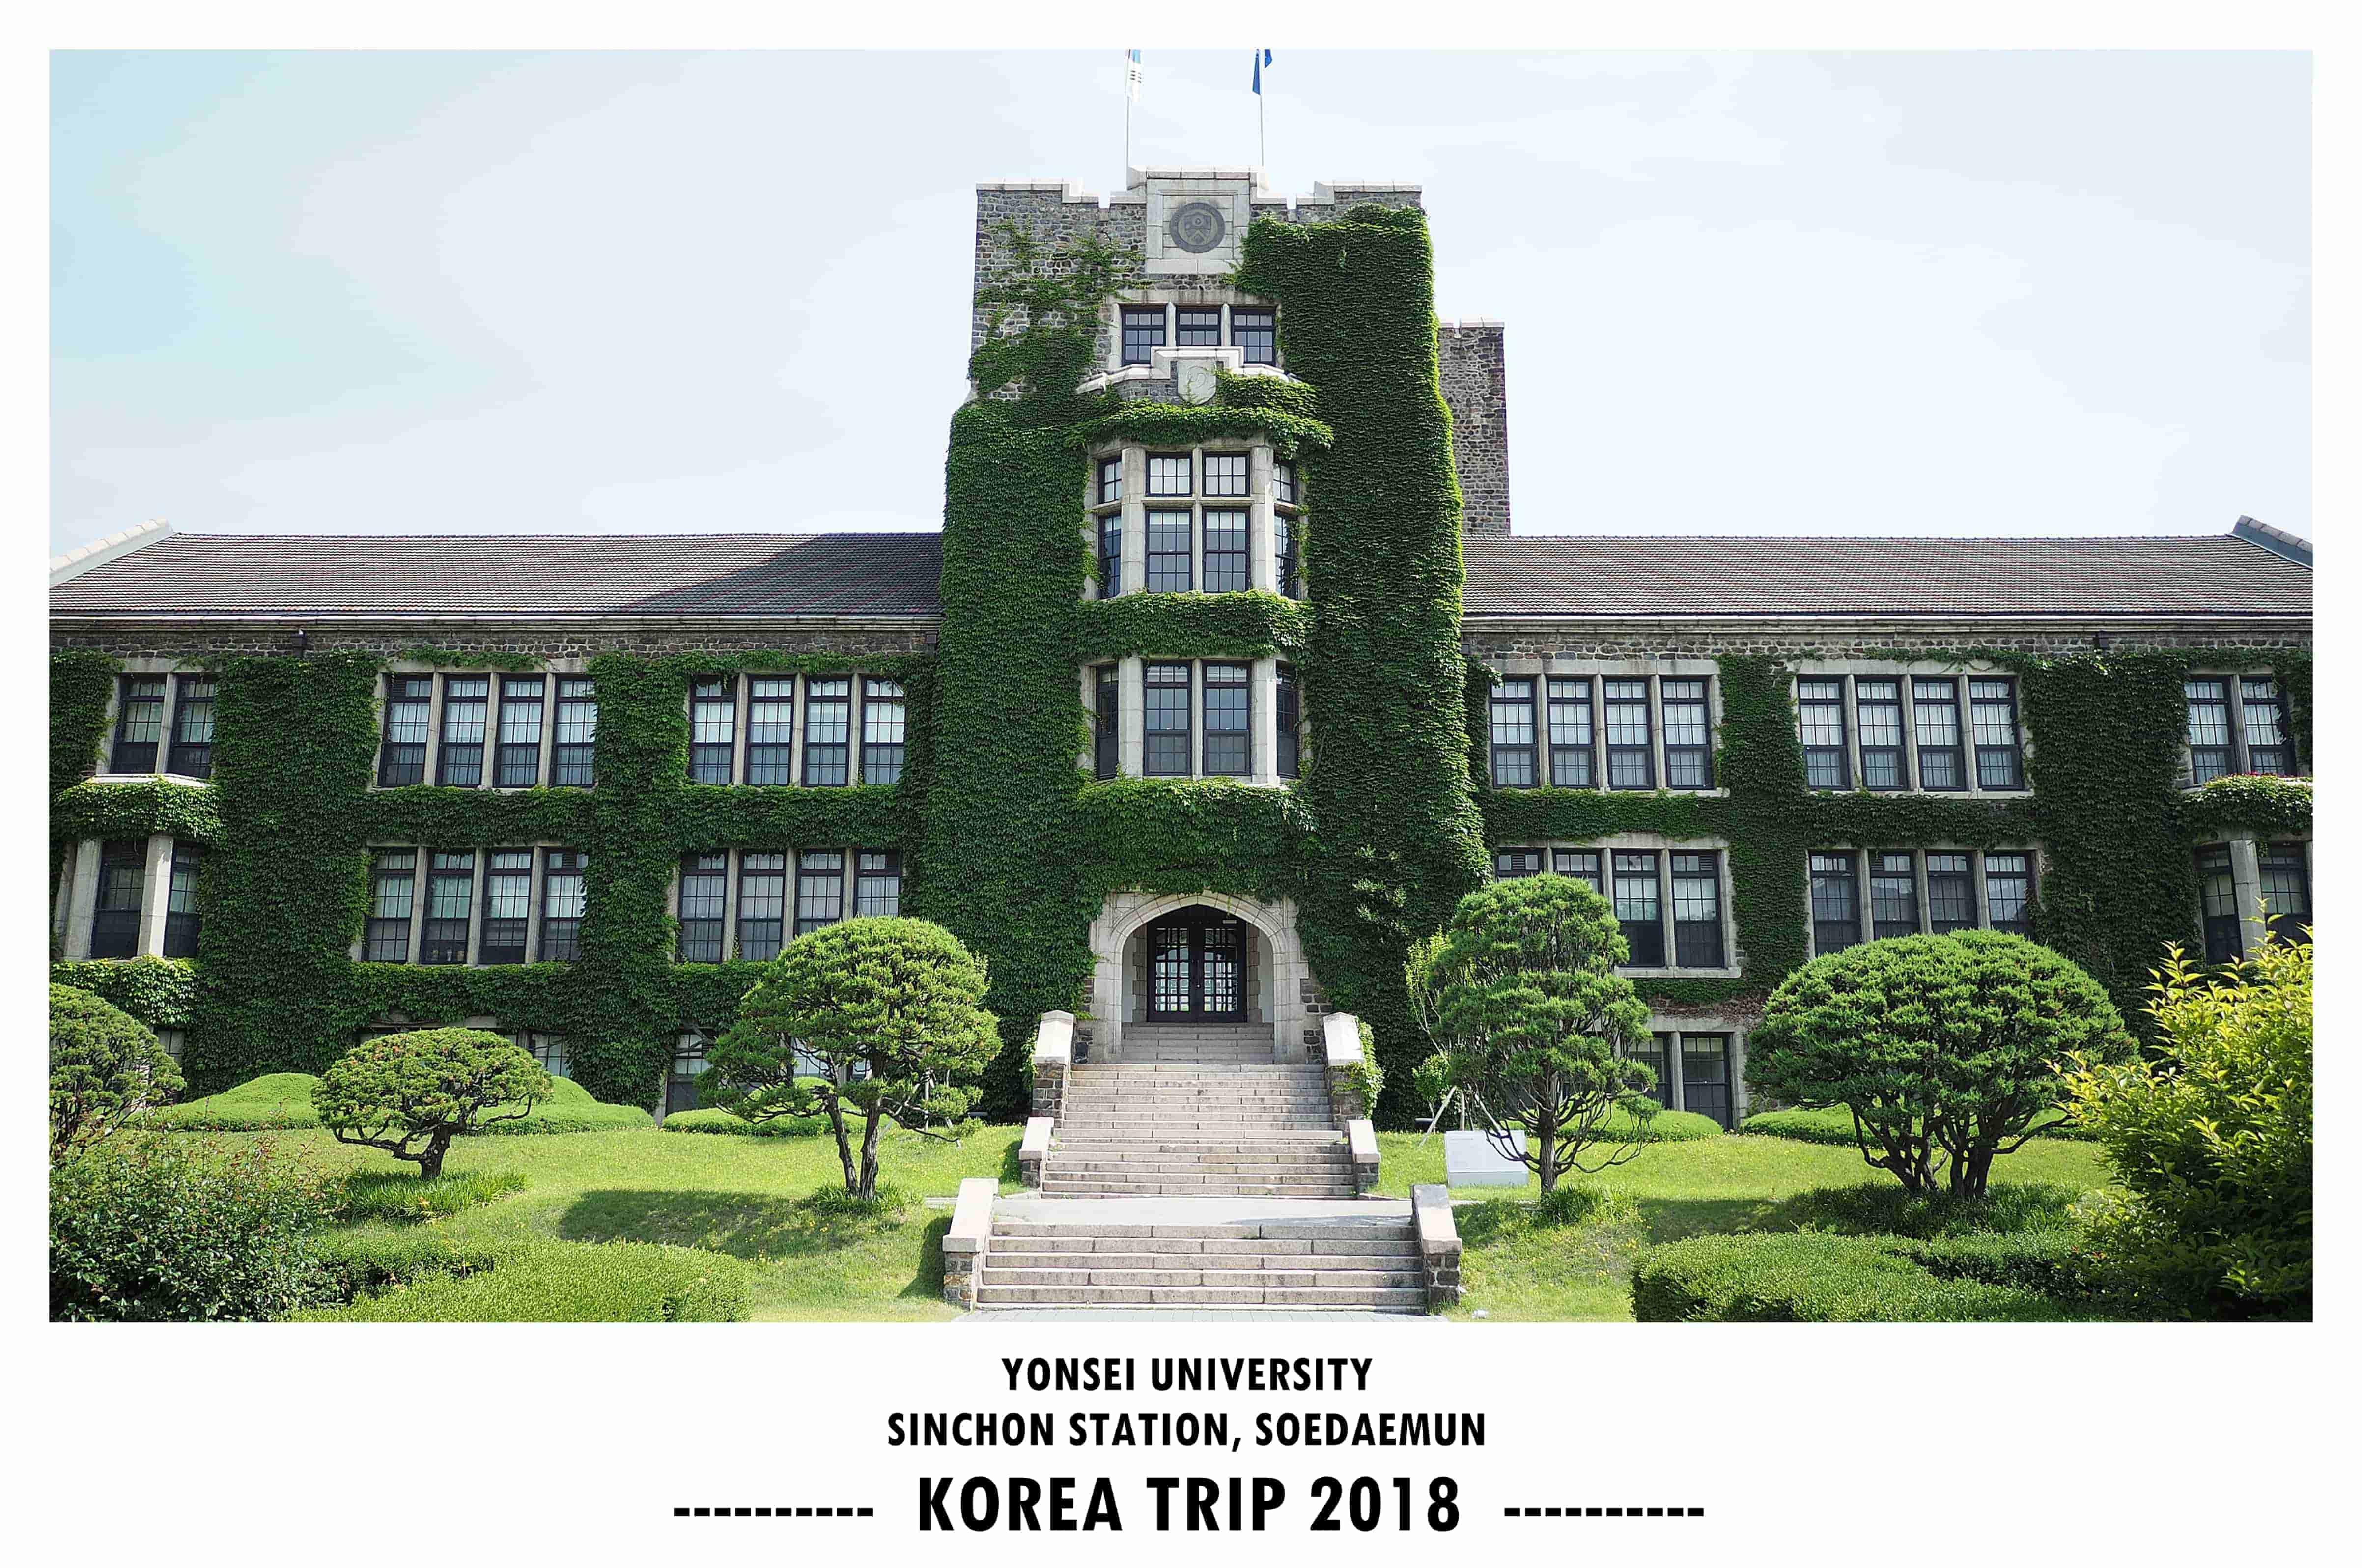 Корё университет (korea university)